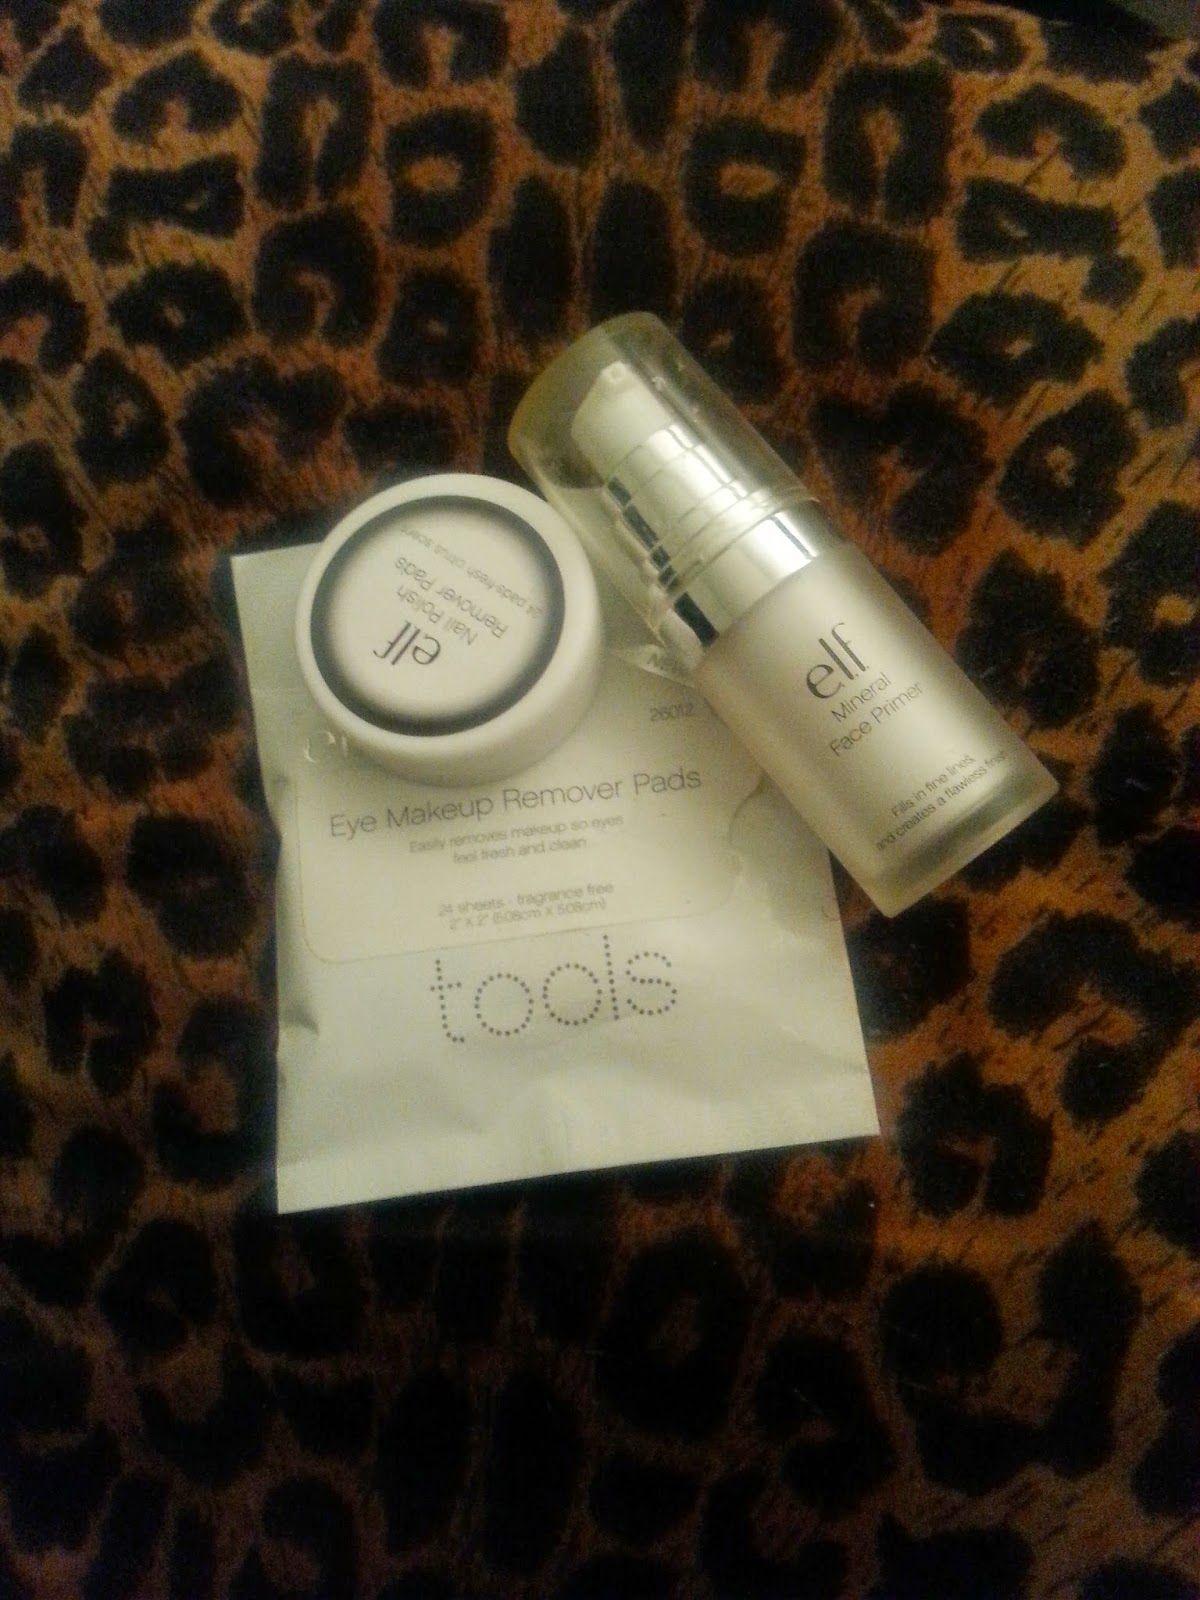 Mini E.L.F. makeup haul and review Makeup remover pads